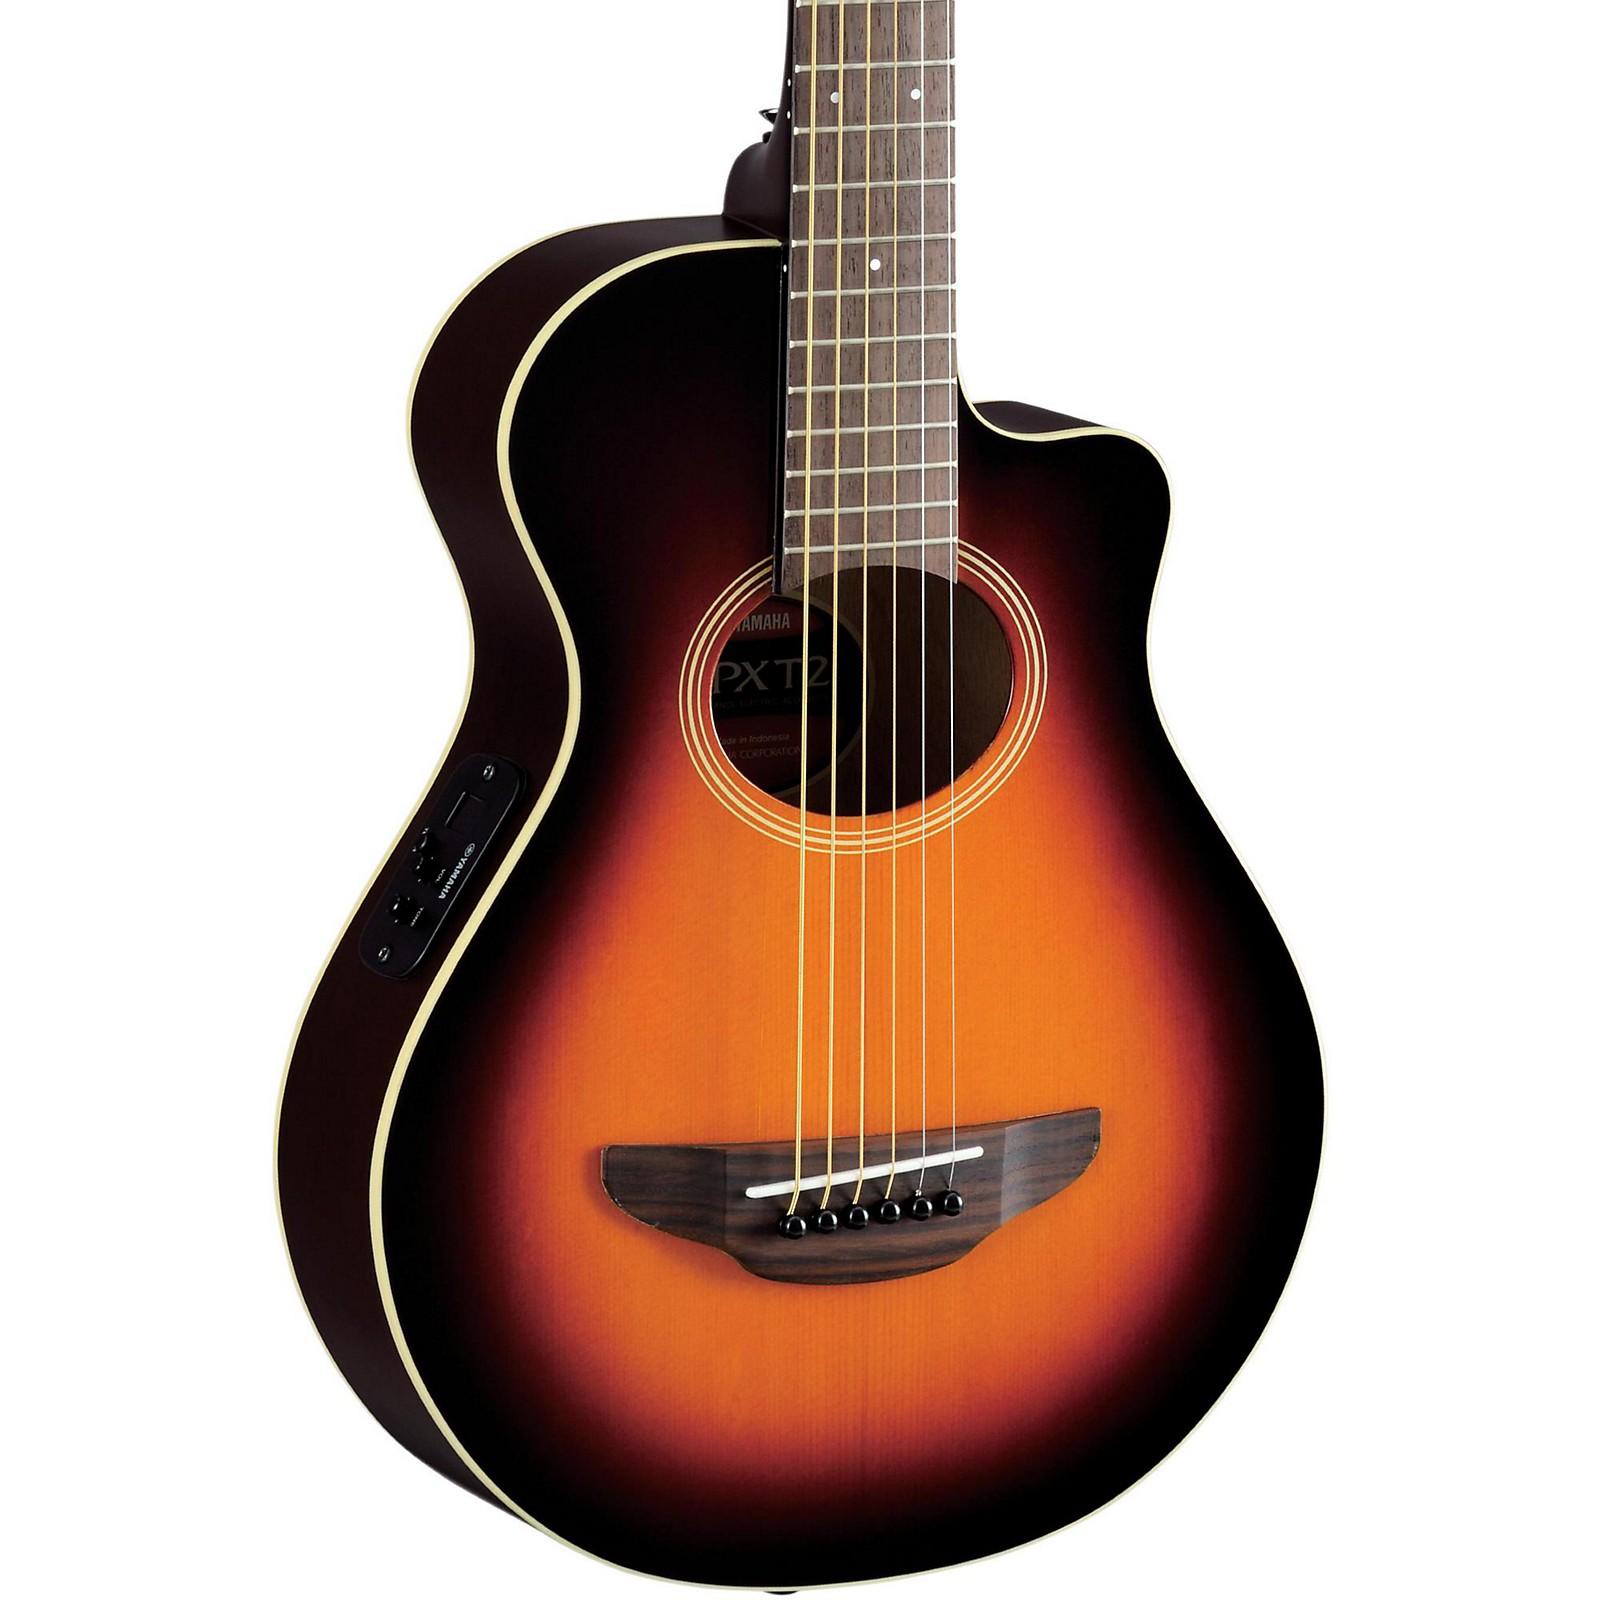 Yamaha Apxt2 3 4 Thinline Acoustic Electric Cutaway Guitar Old Violin Sunburst Guitar Center